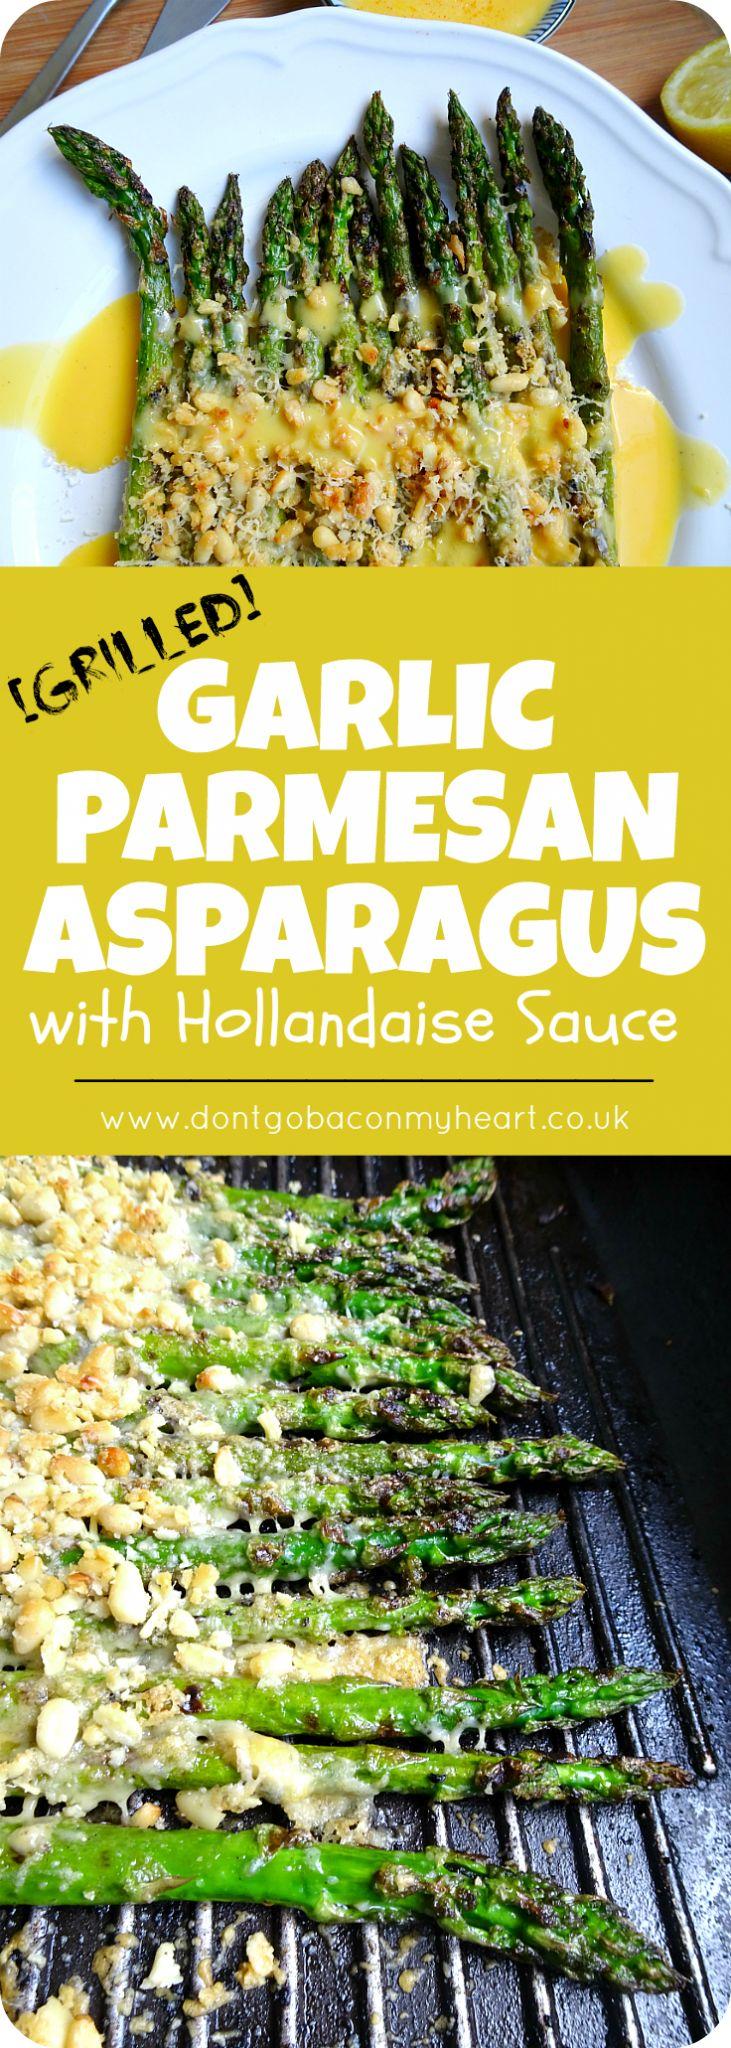 Grilled Garlic & Parmesan Asparagus with Hollandaise Sauce